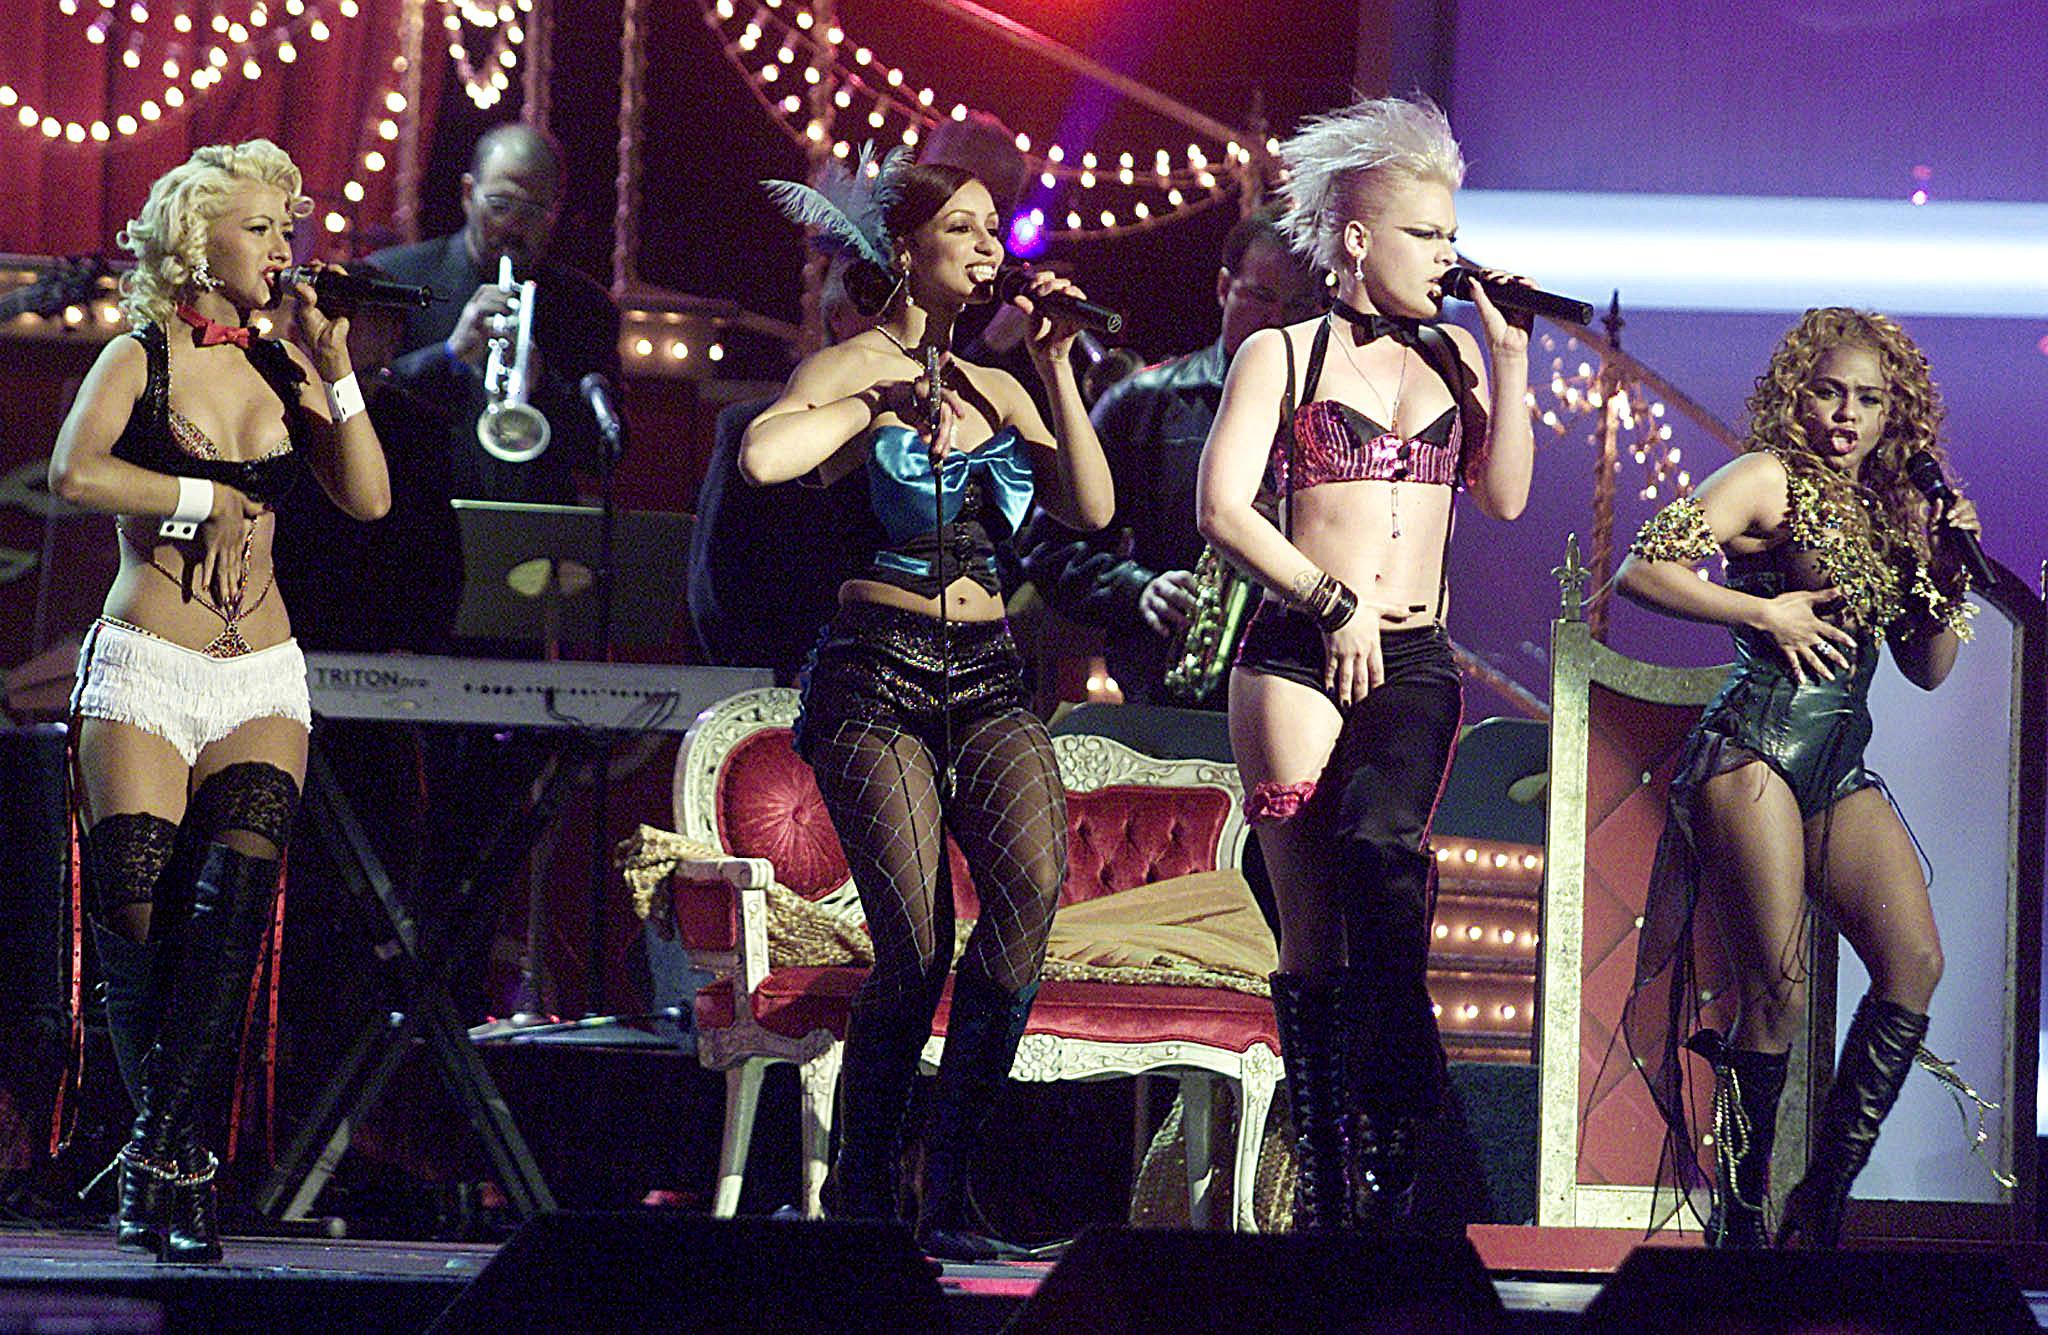 Christina Aguilera, Lil' Kim, Mya / Pink / Lady Marmalade